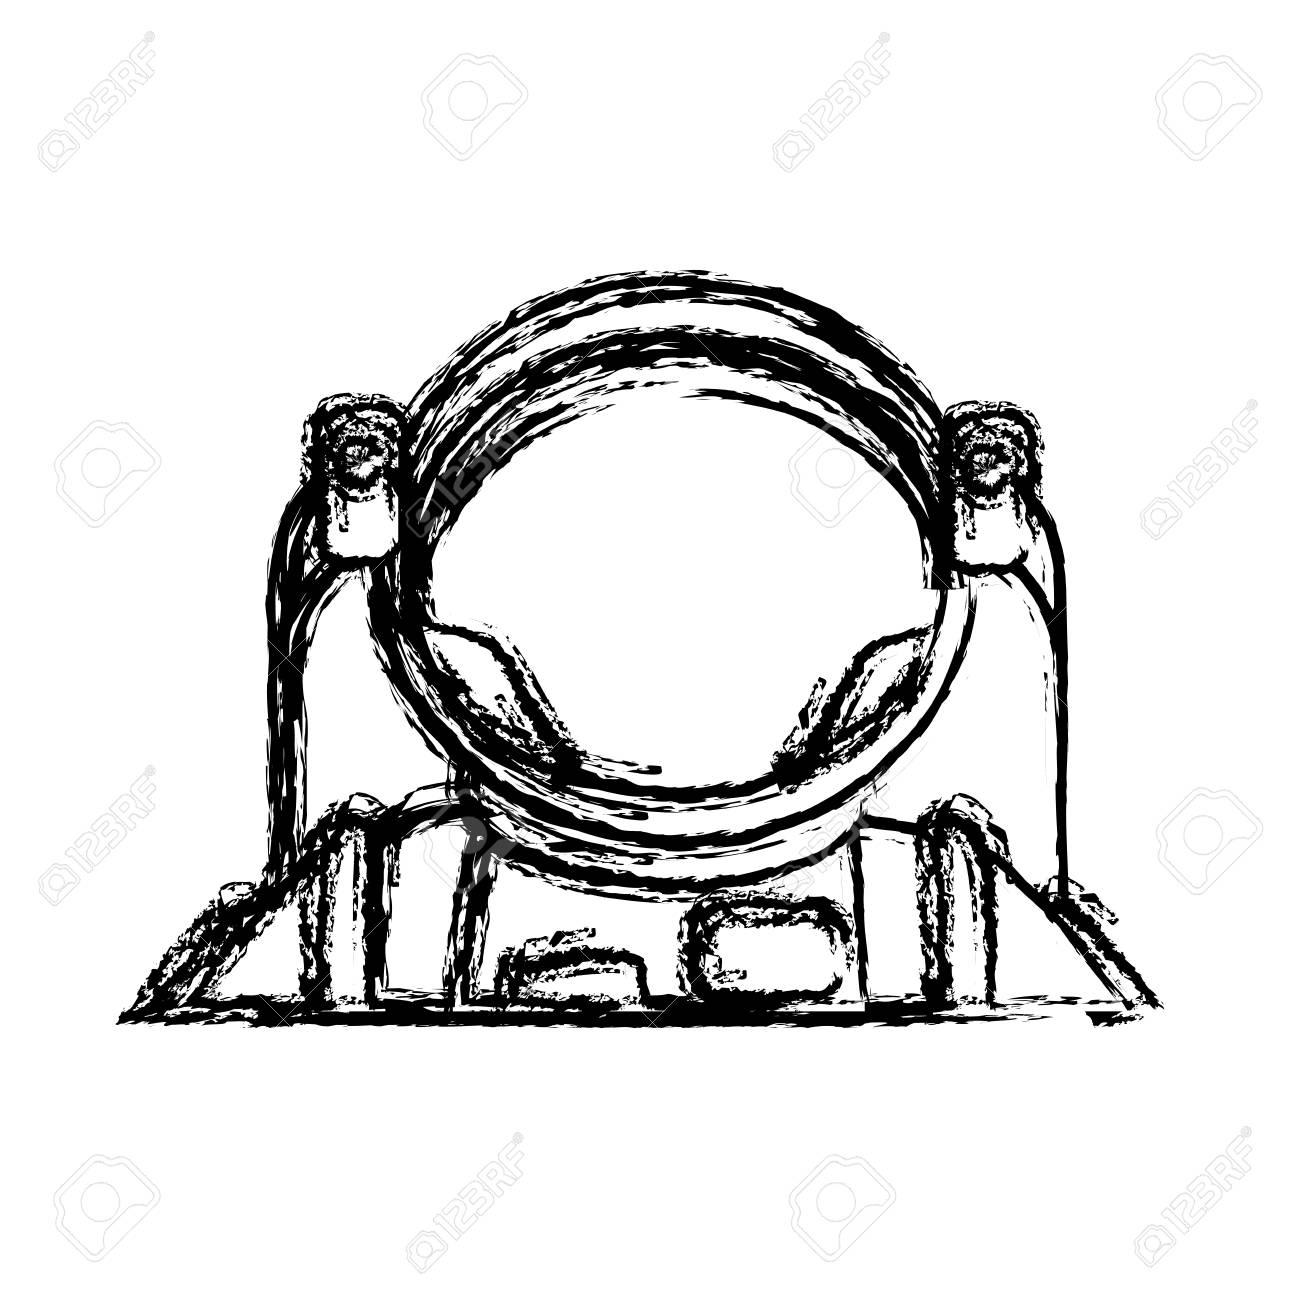 1300x1300 Astronaut Portrait In Space Suit Helmet Vector Illustration